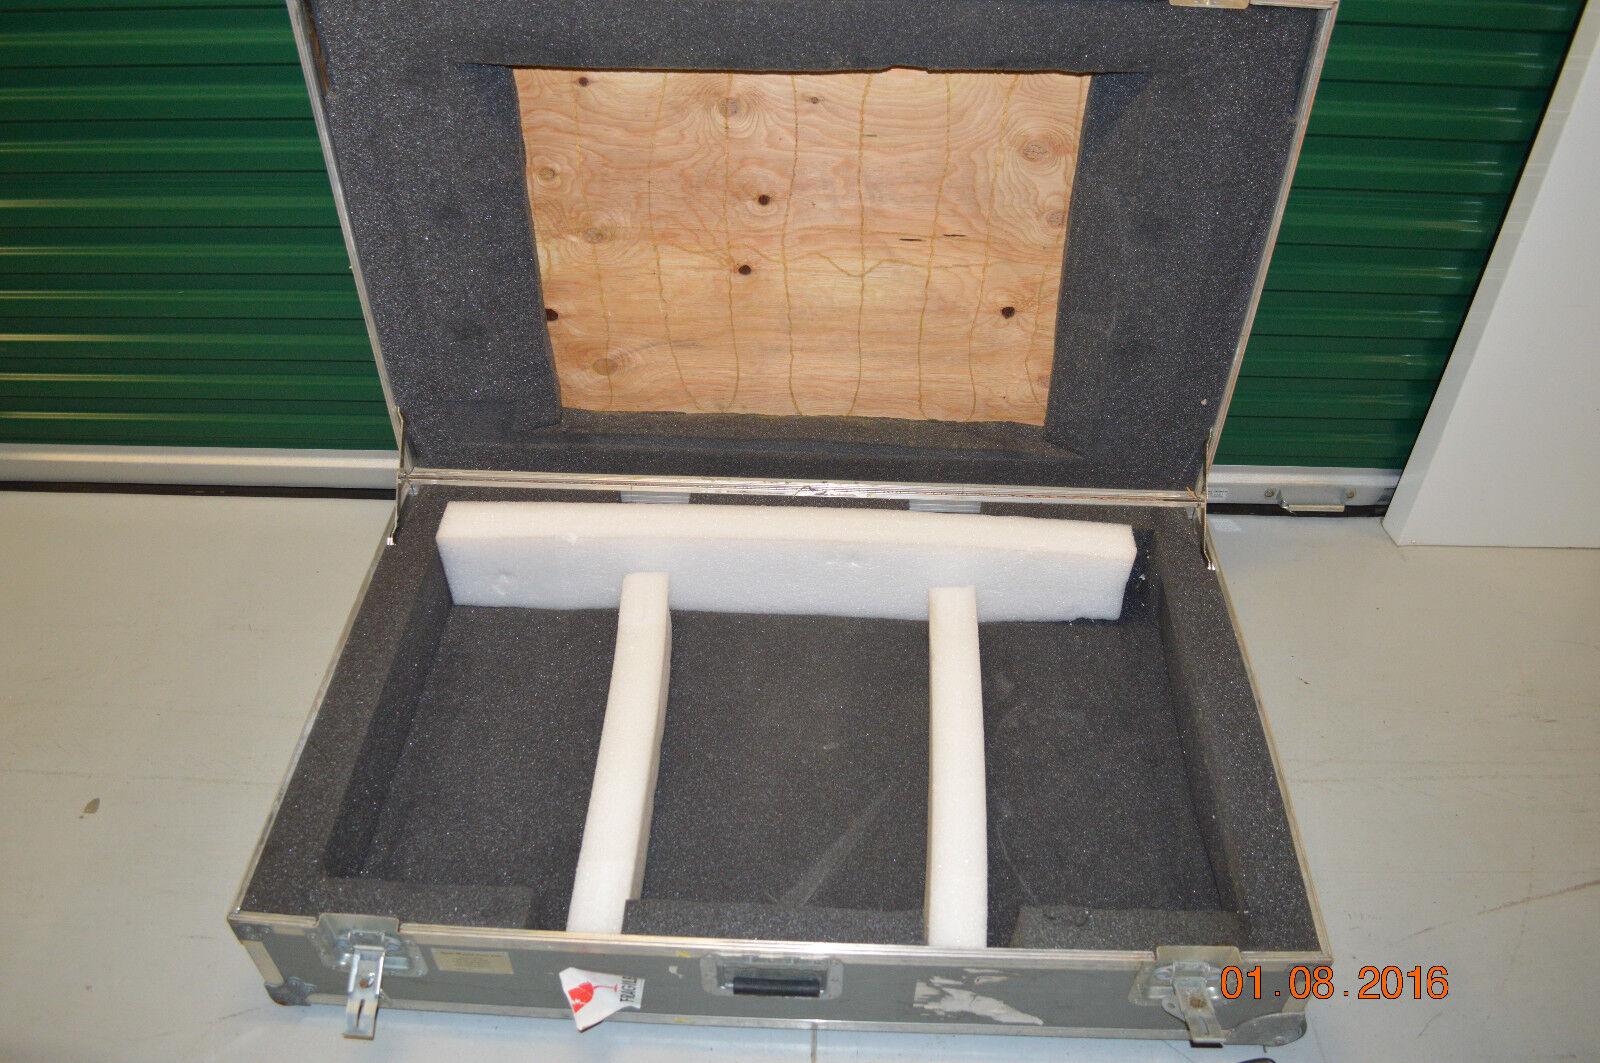 New World Case 5142 LCD LED Plasma Monitor TV Equipment Shipping Case w wheels